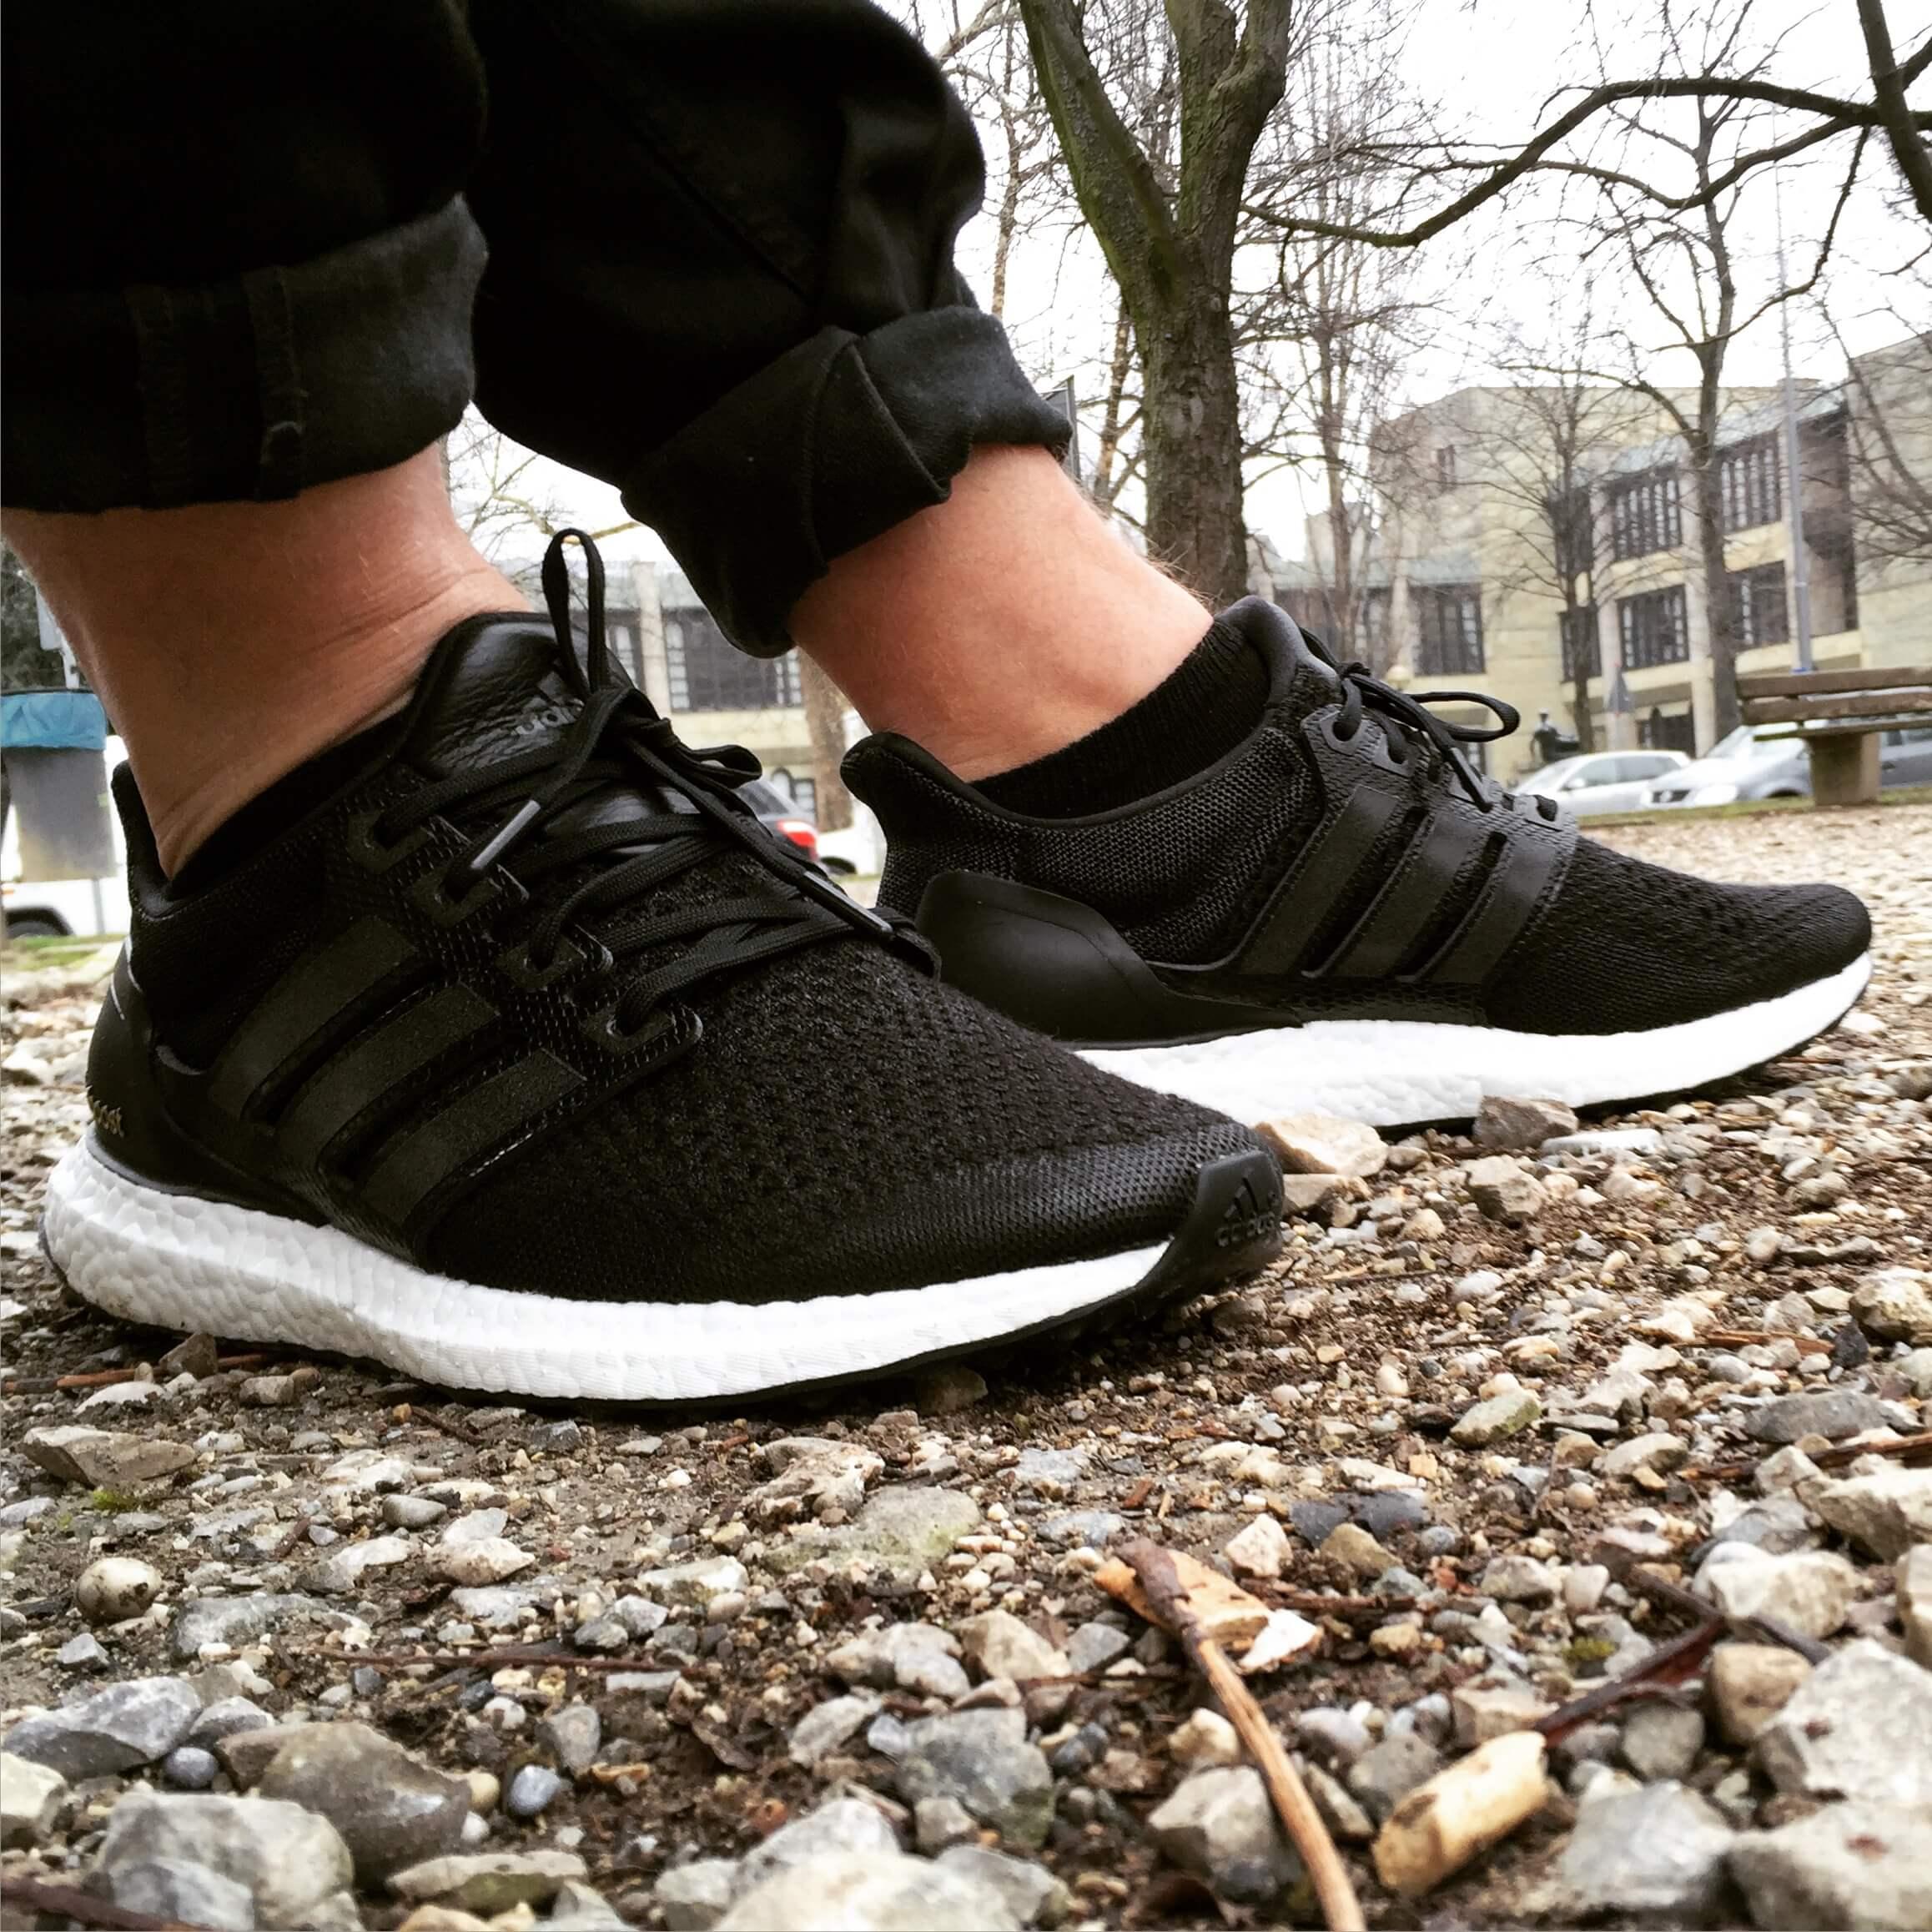 Adidas-Ultra Boost-J&D-Collective-Side-View-Benstah-Onfeet